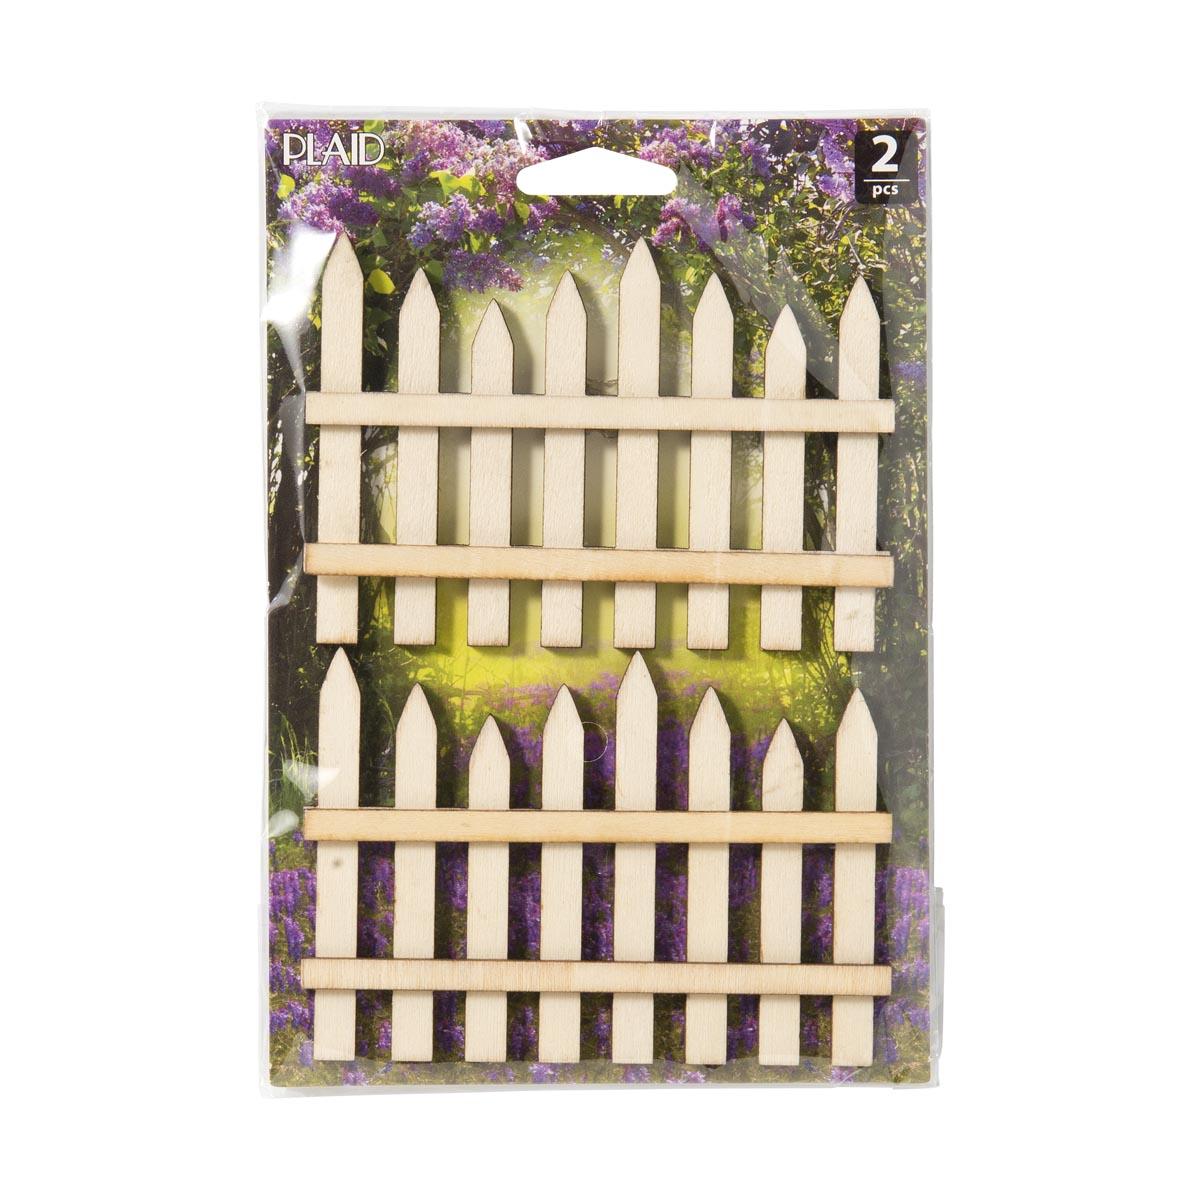 Plaid ® Wood Surfaces - Fairy Garden - Fence 2 pc. - 22563E